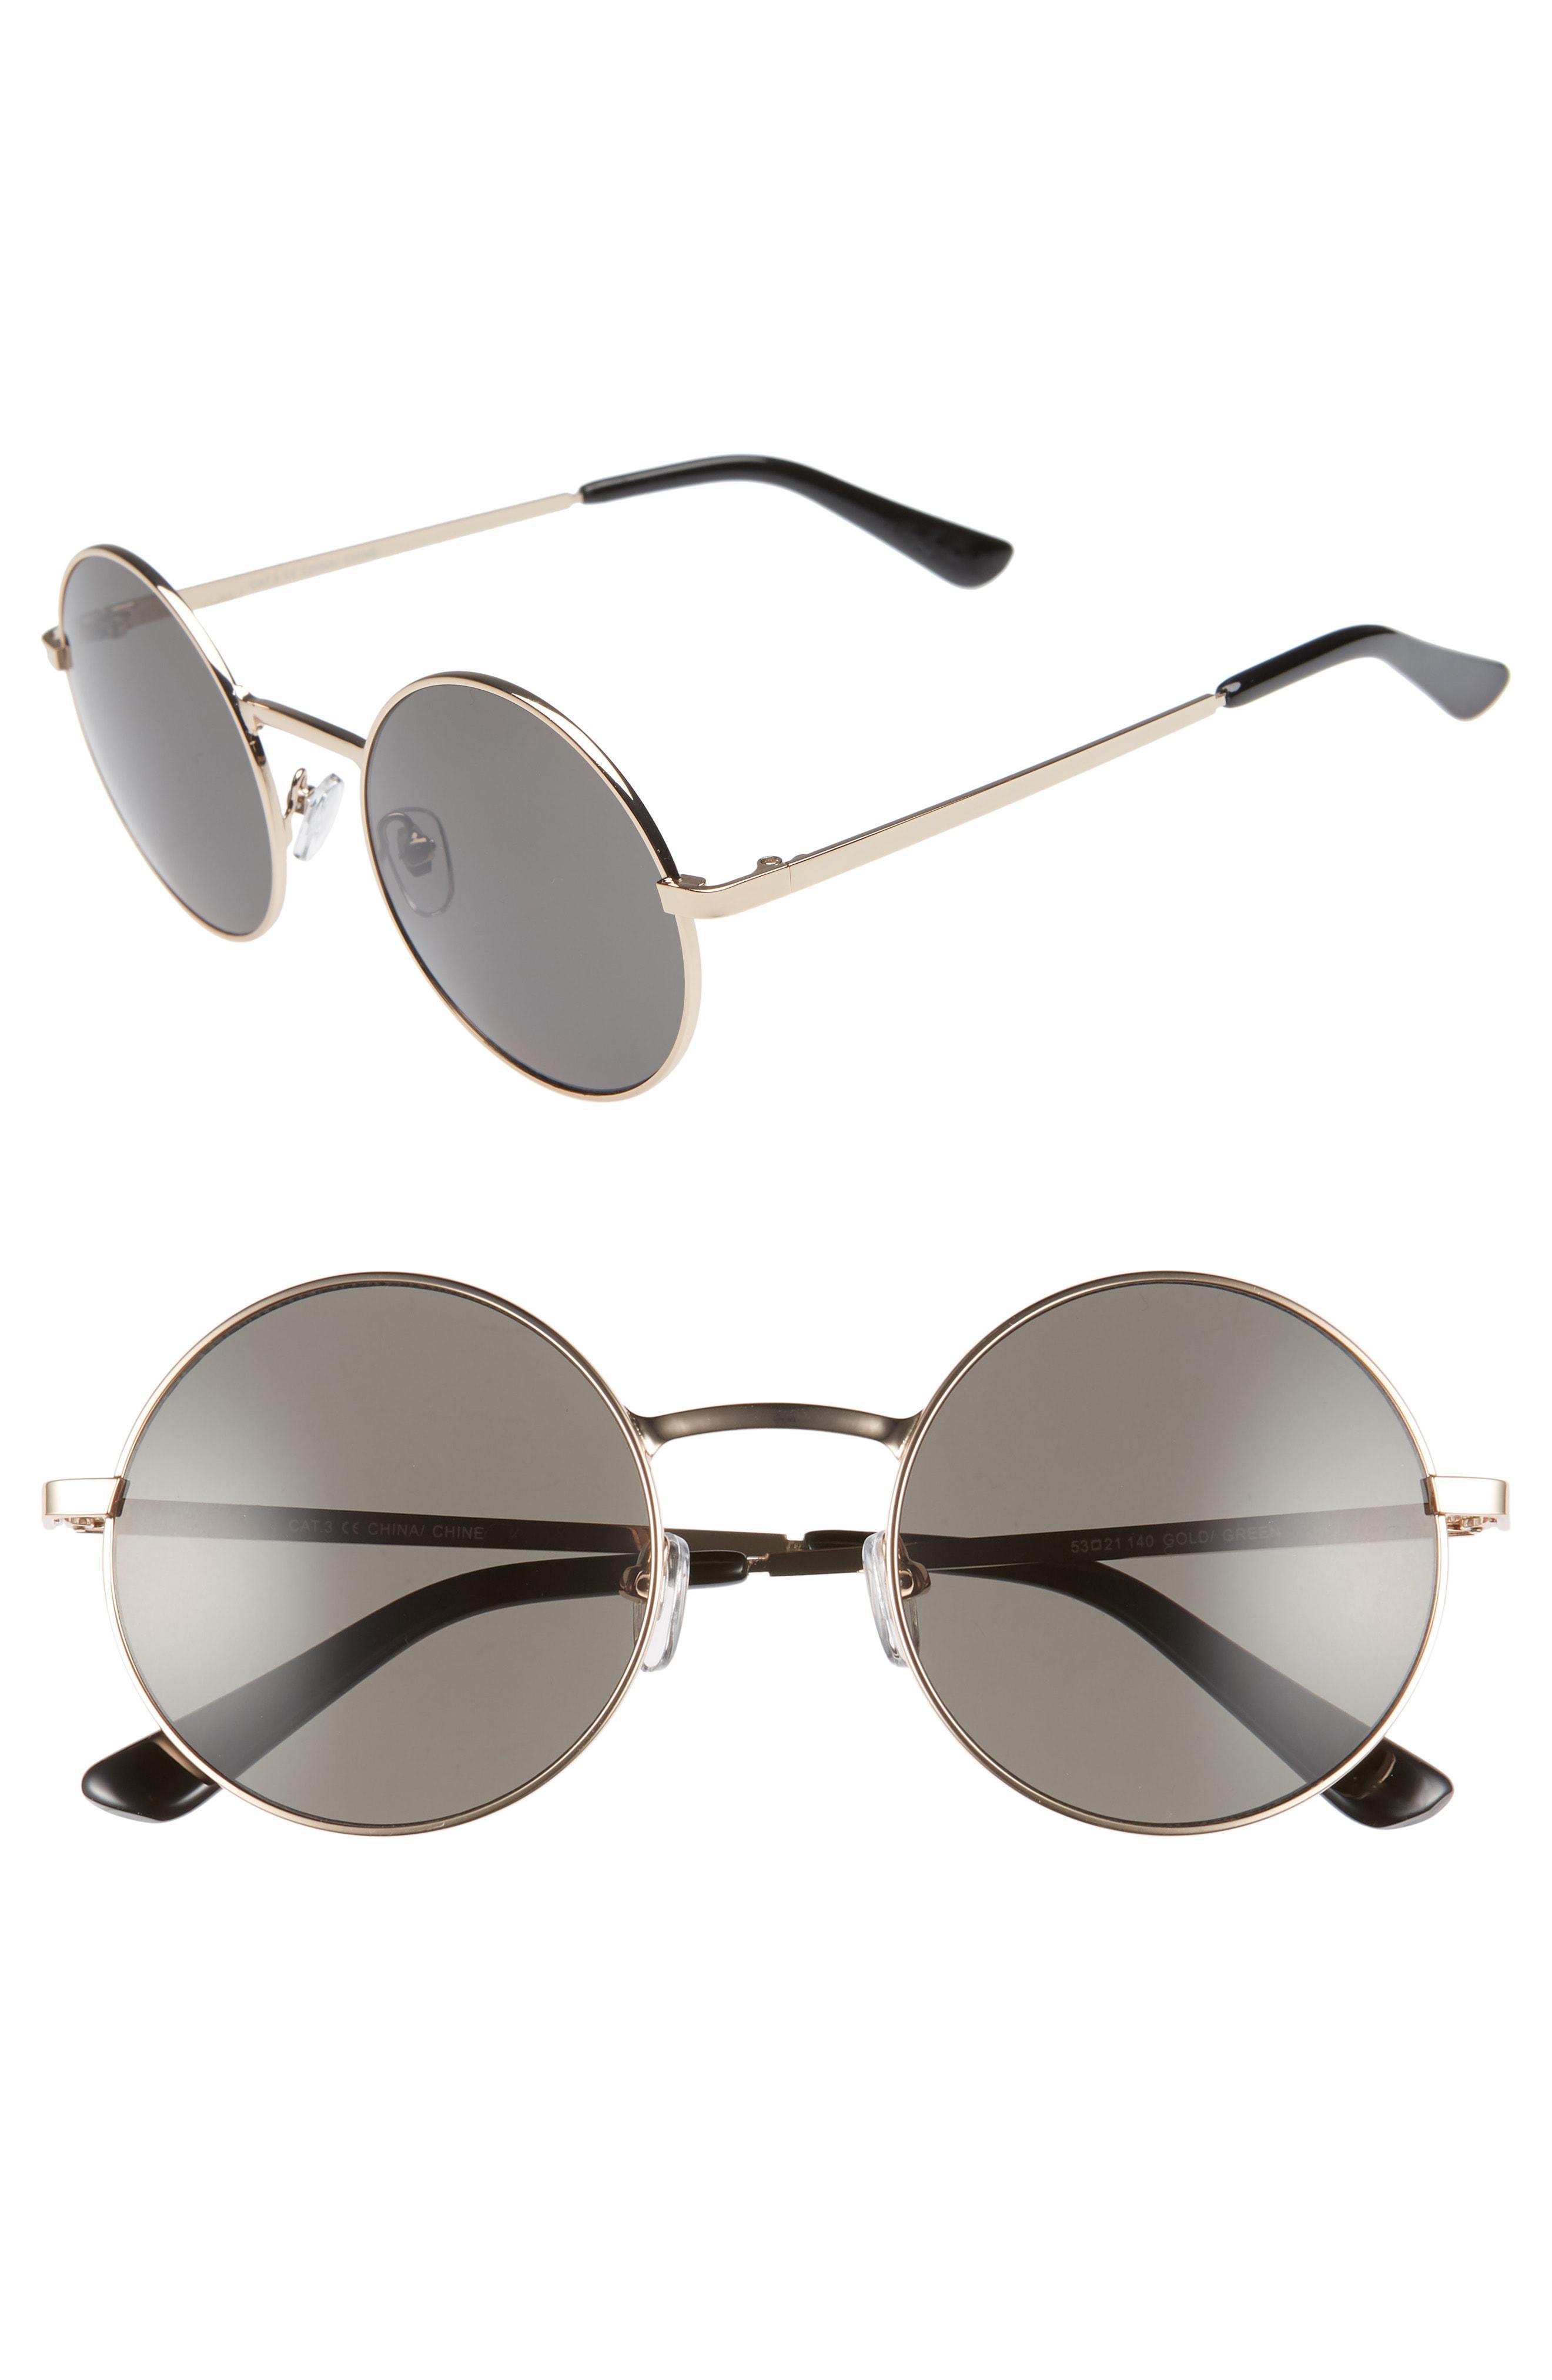 7eaa1643883 Lyst - Nordstrom 1901 Burke 53mm Round Sunglasses in Metallic for Men